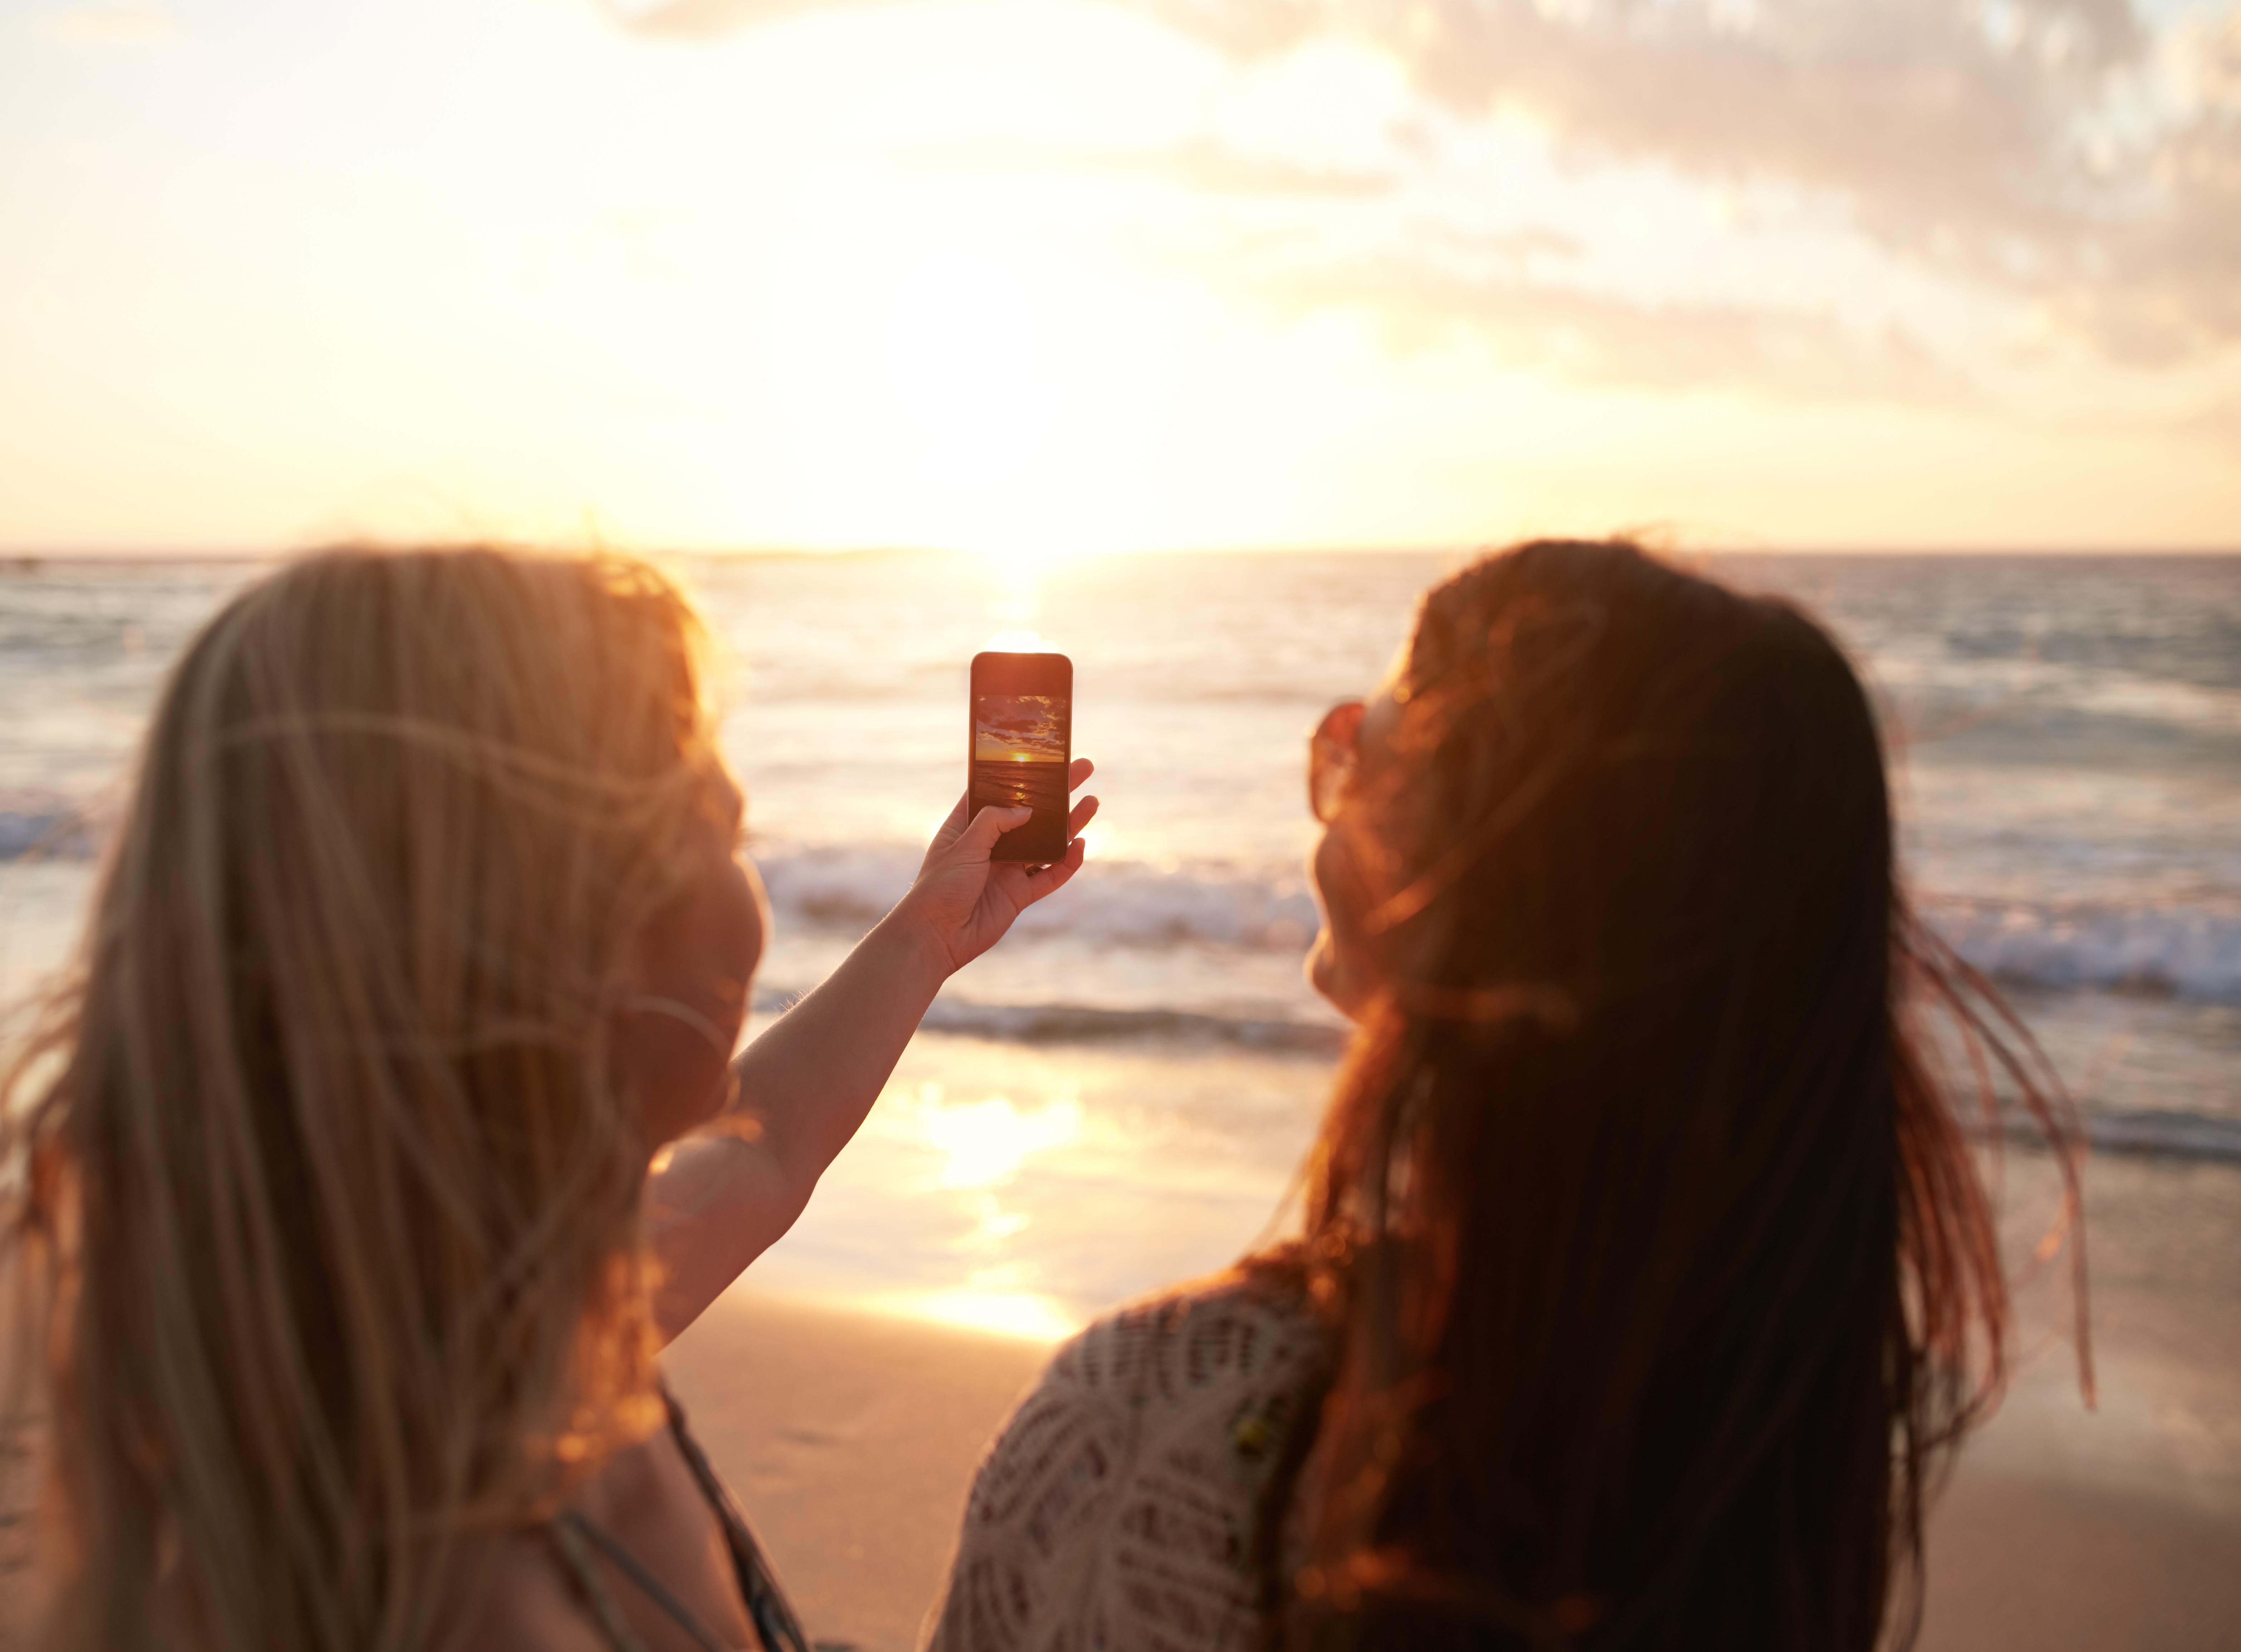 two women taking a photo